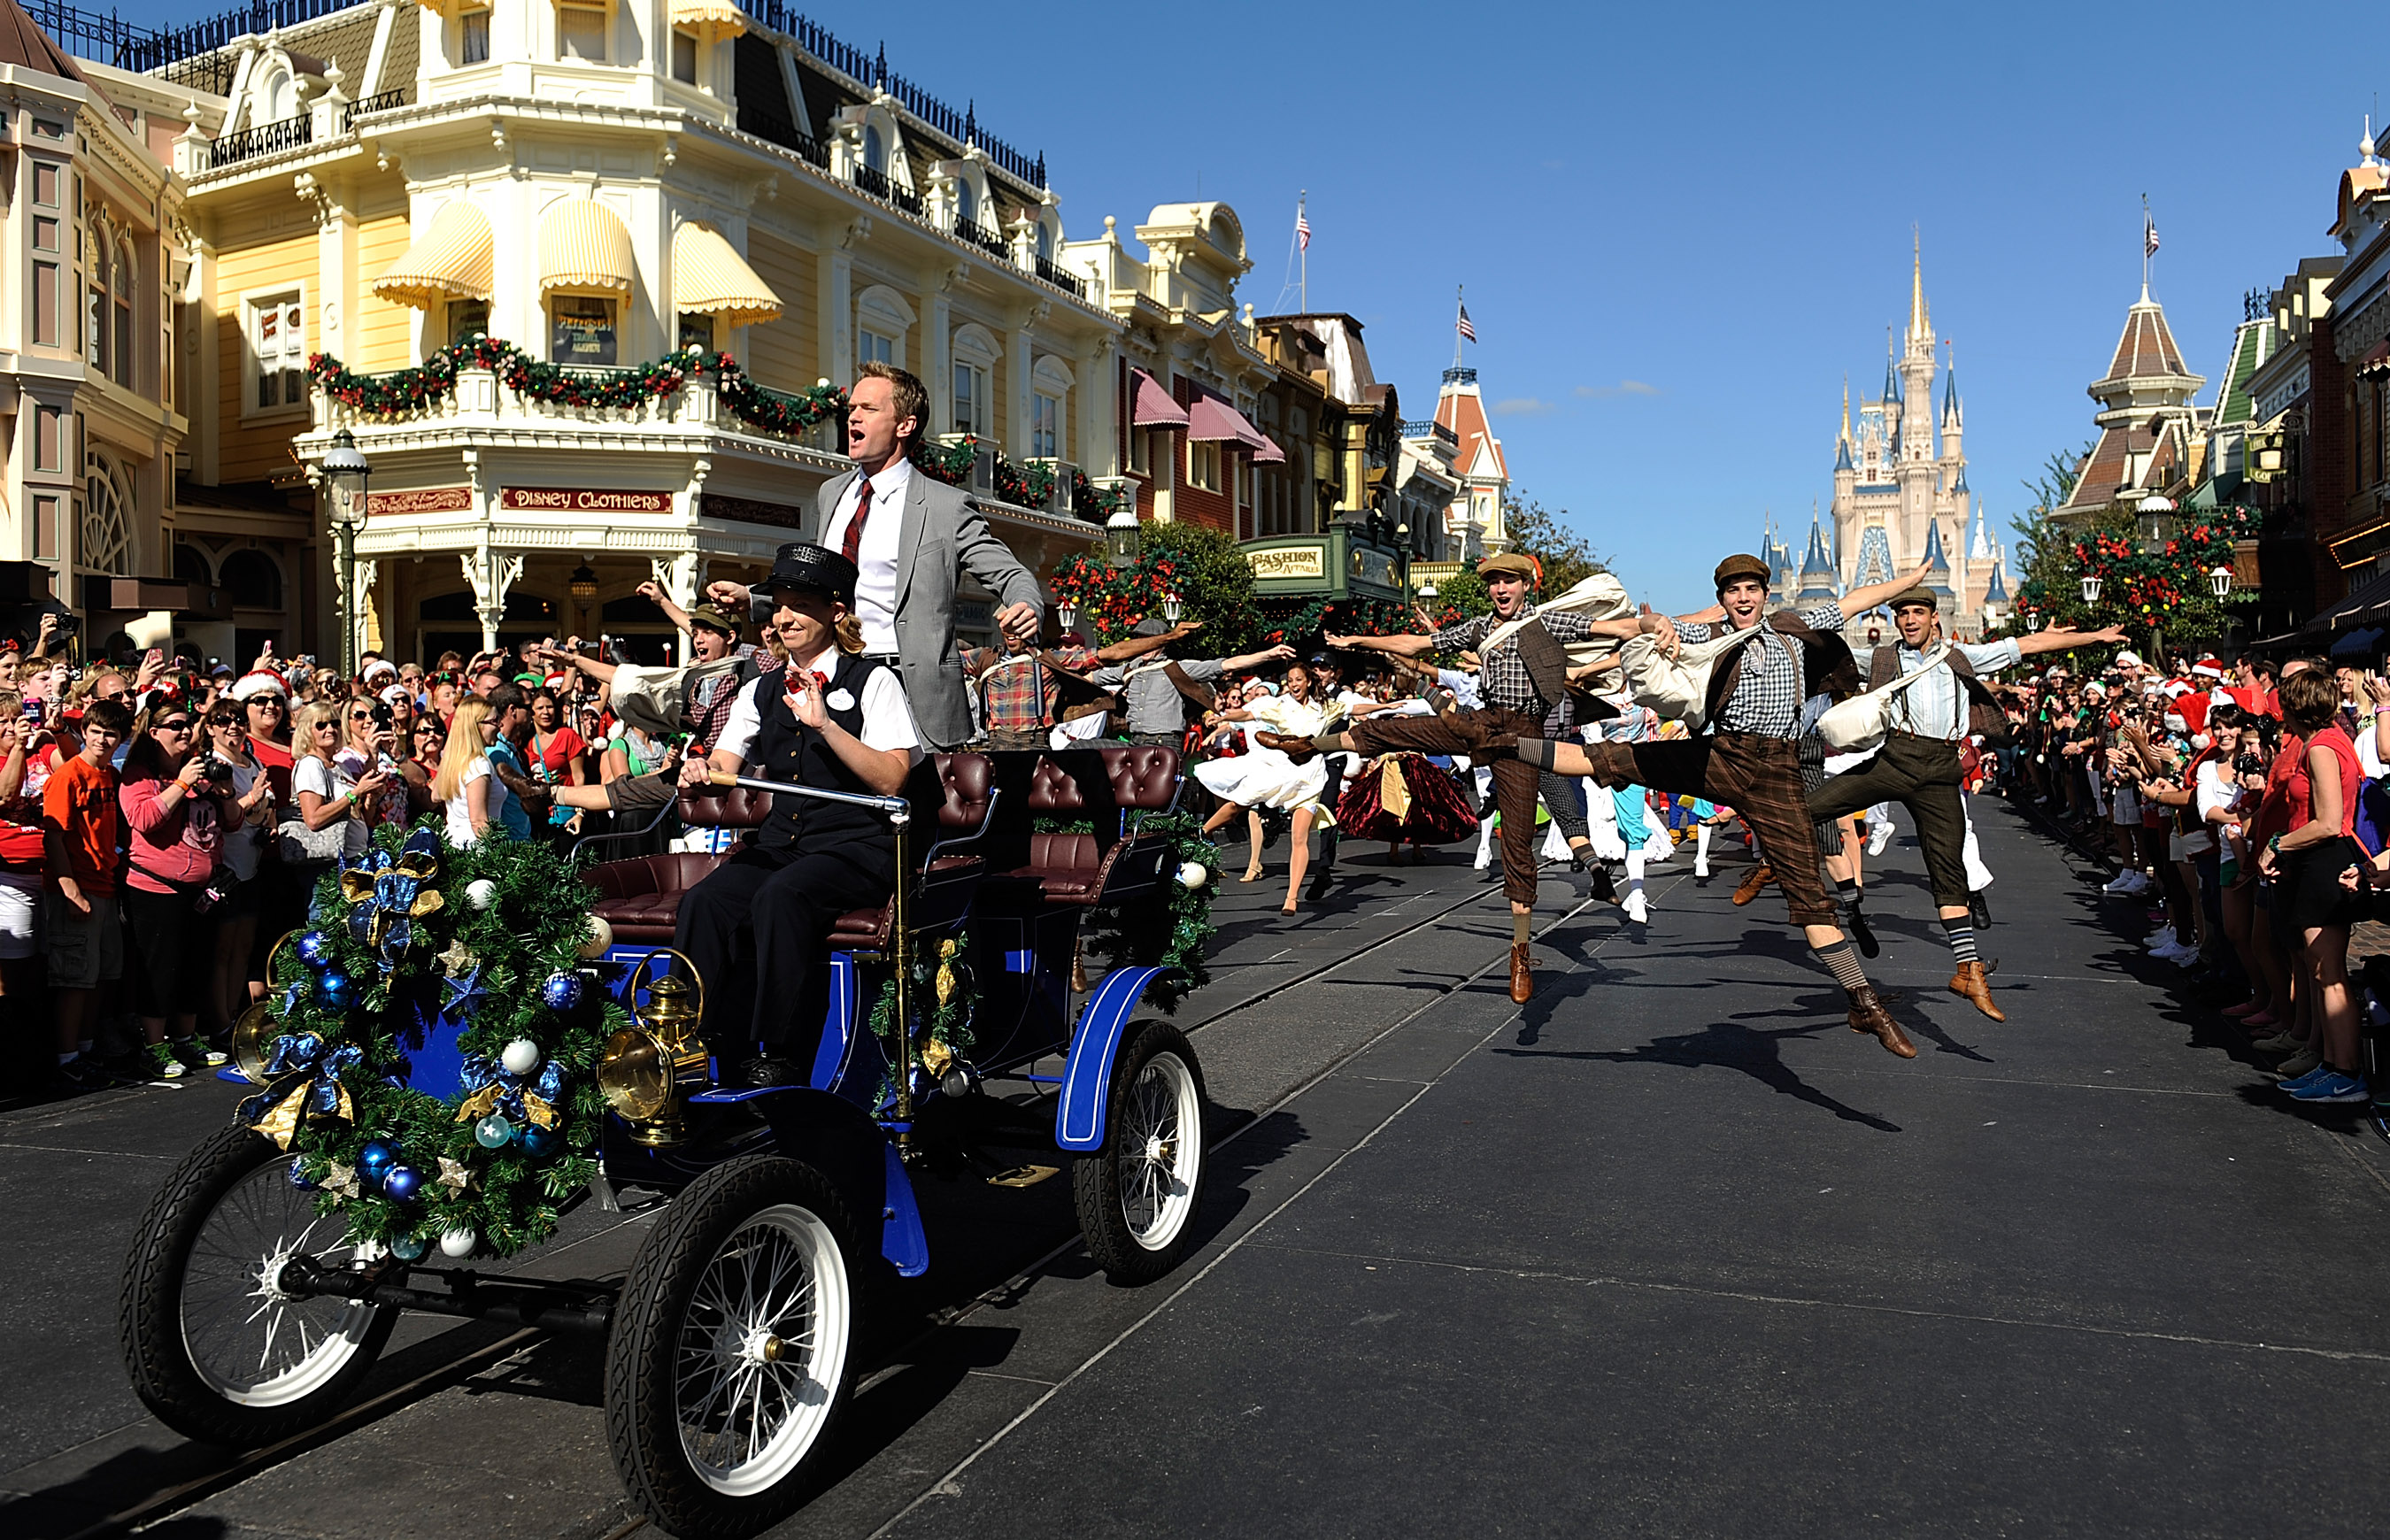 image - Disney Christmas Day Parade